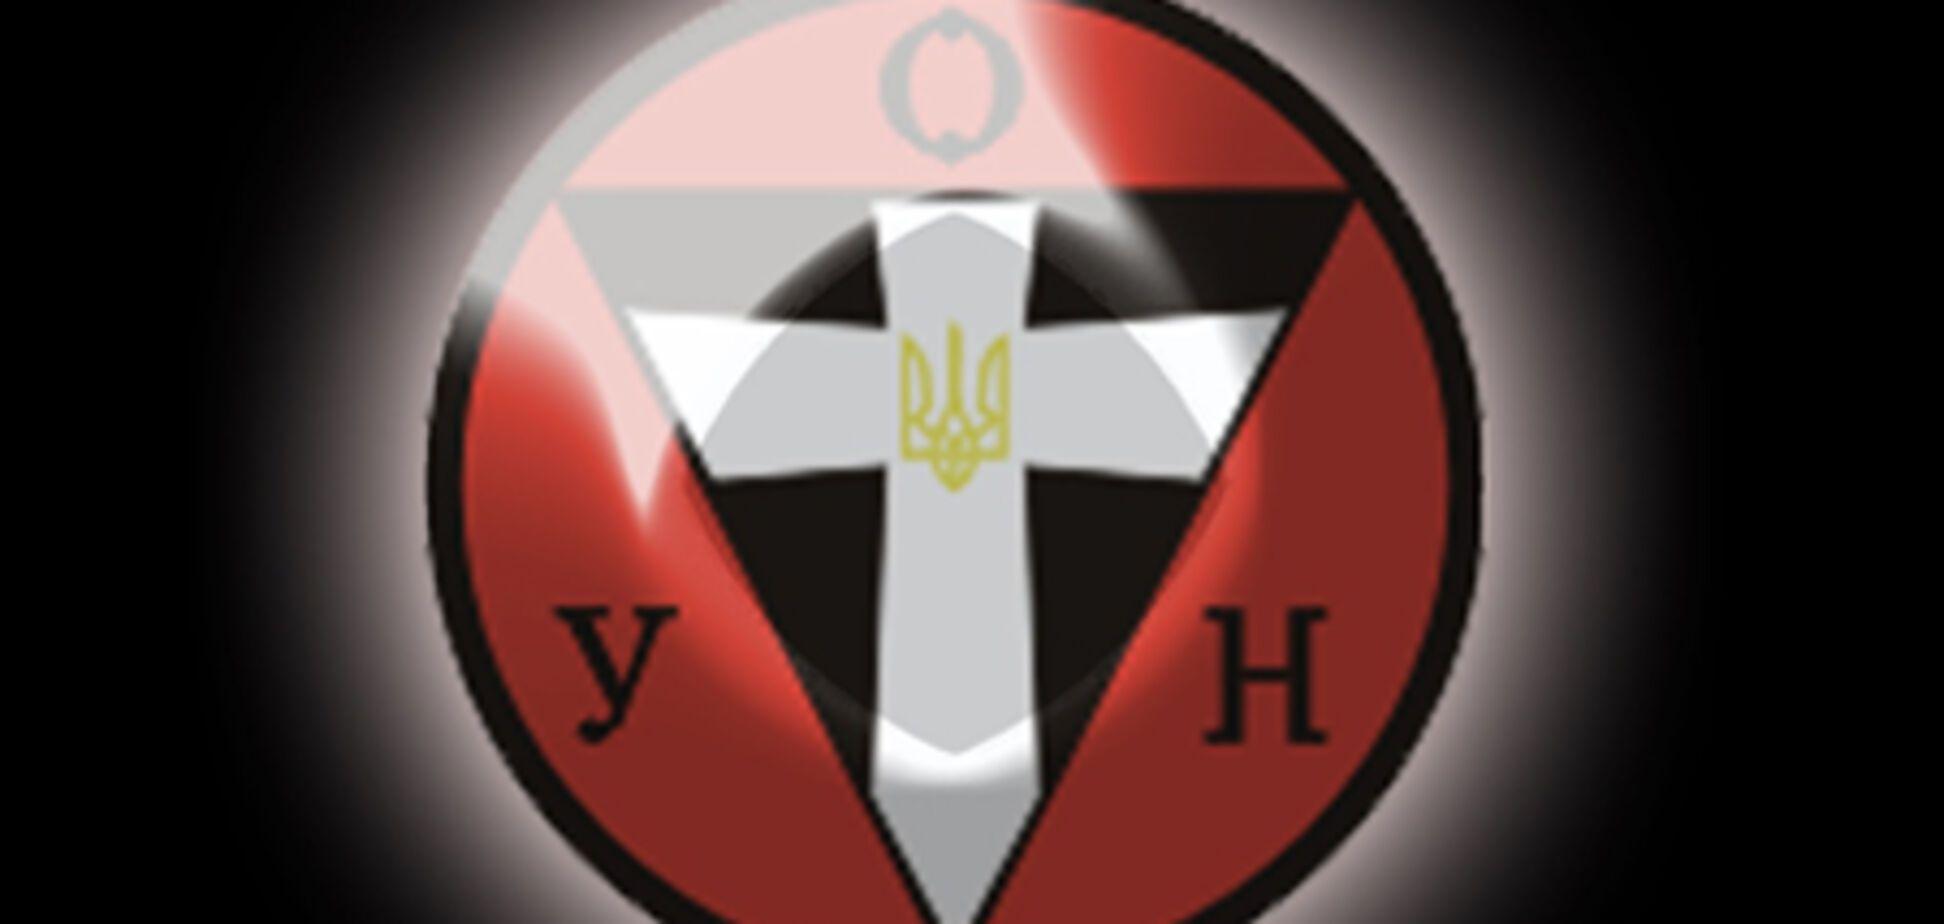 Українська діаспора заступилася за Бандеру